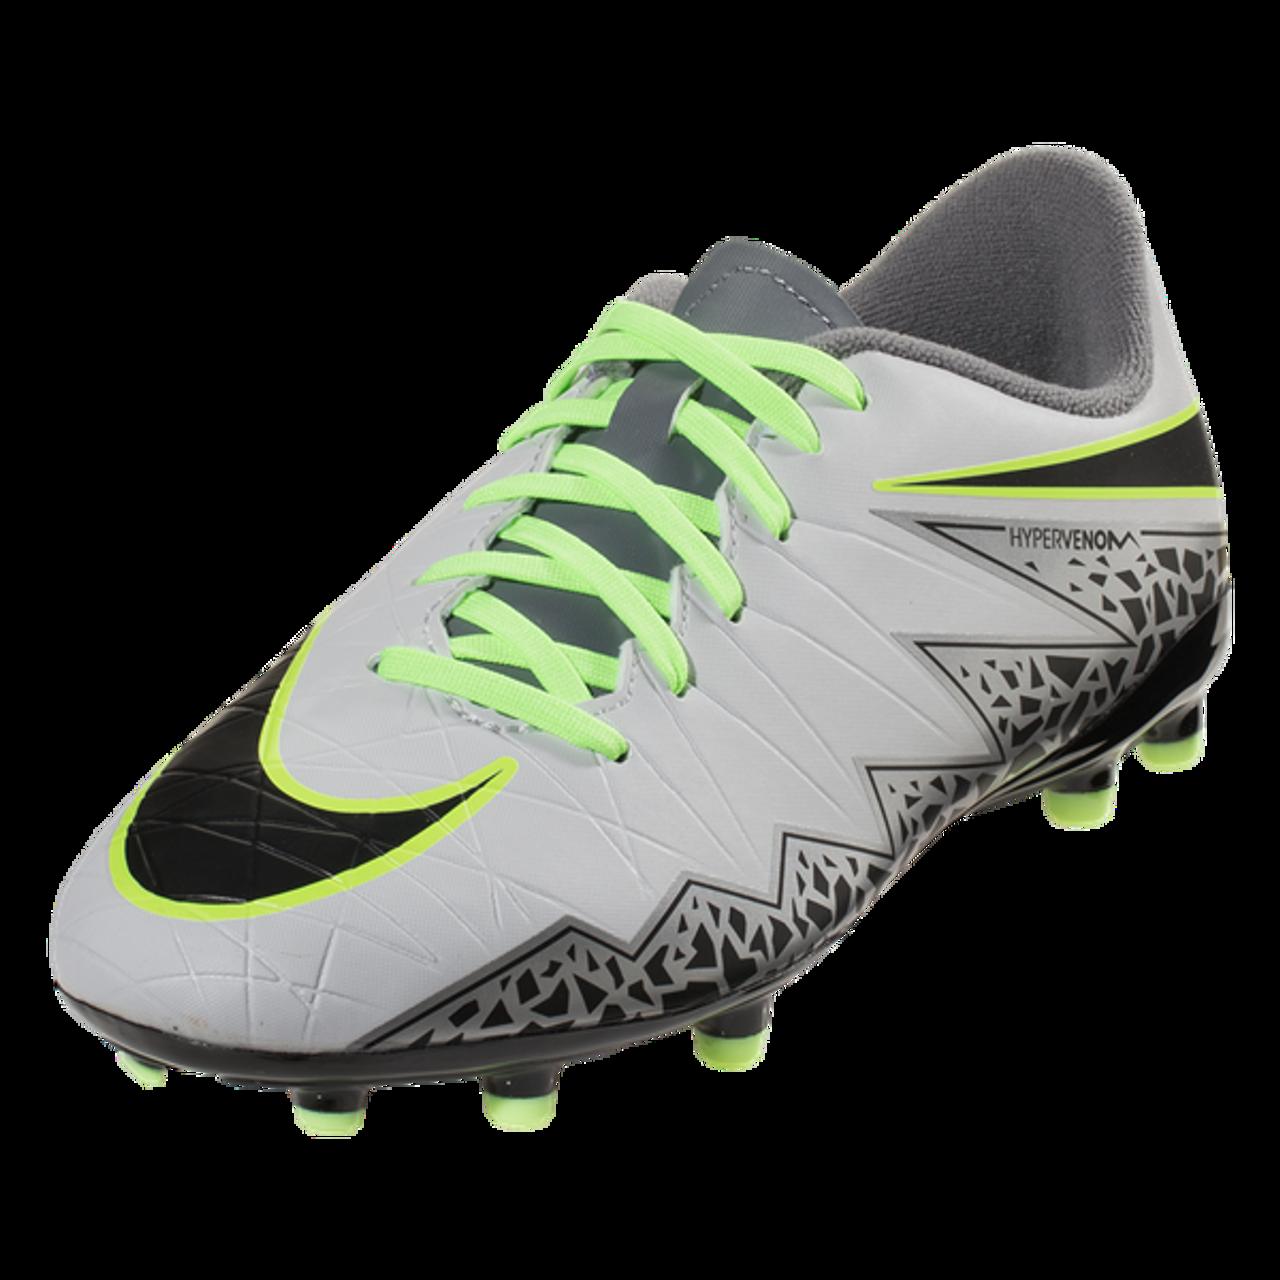 size 40 55d48 cd4a3 Nike Hypervenom Phelon II FG - Pure Platinum/Black/Ghost Green/Cool  Grey/Metallic Silver/Clear Jade (123016)